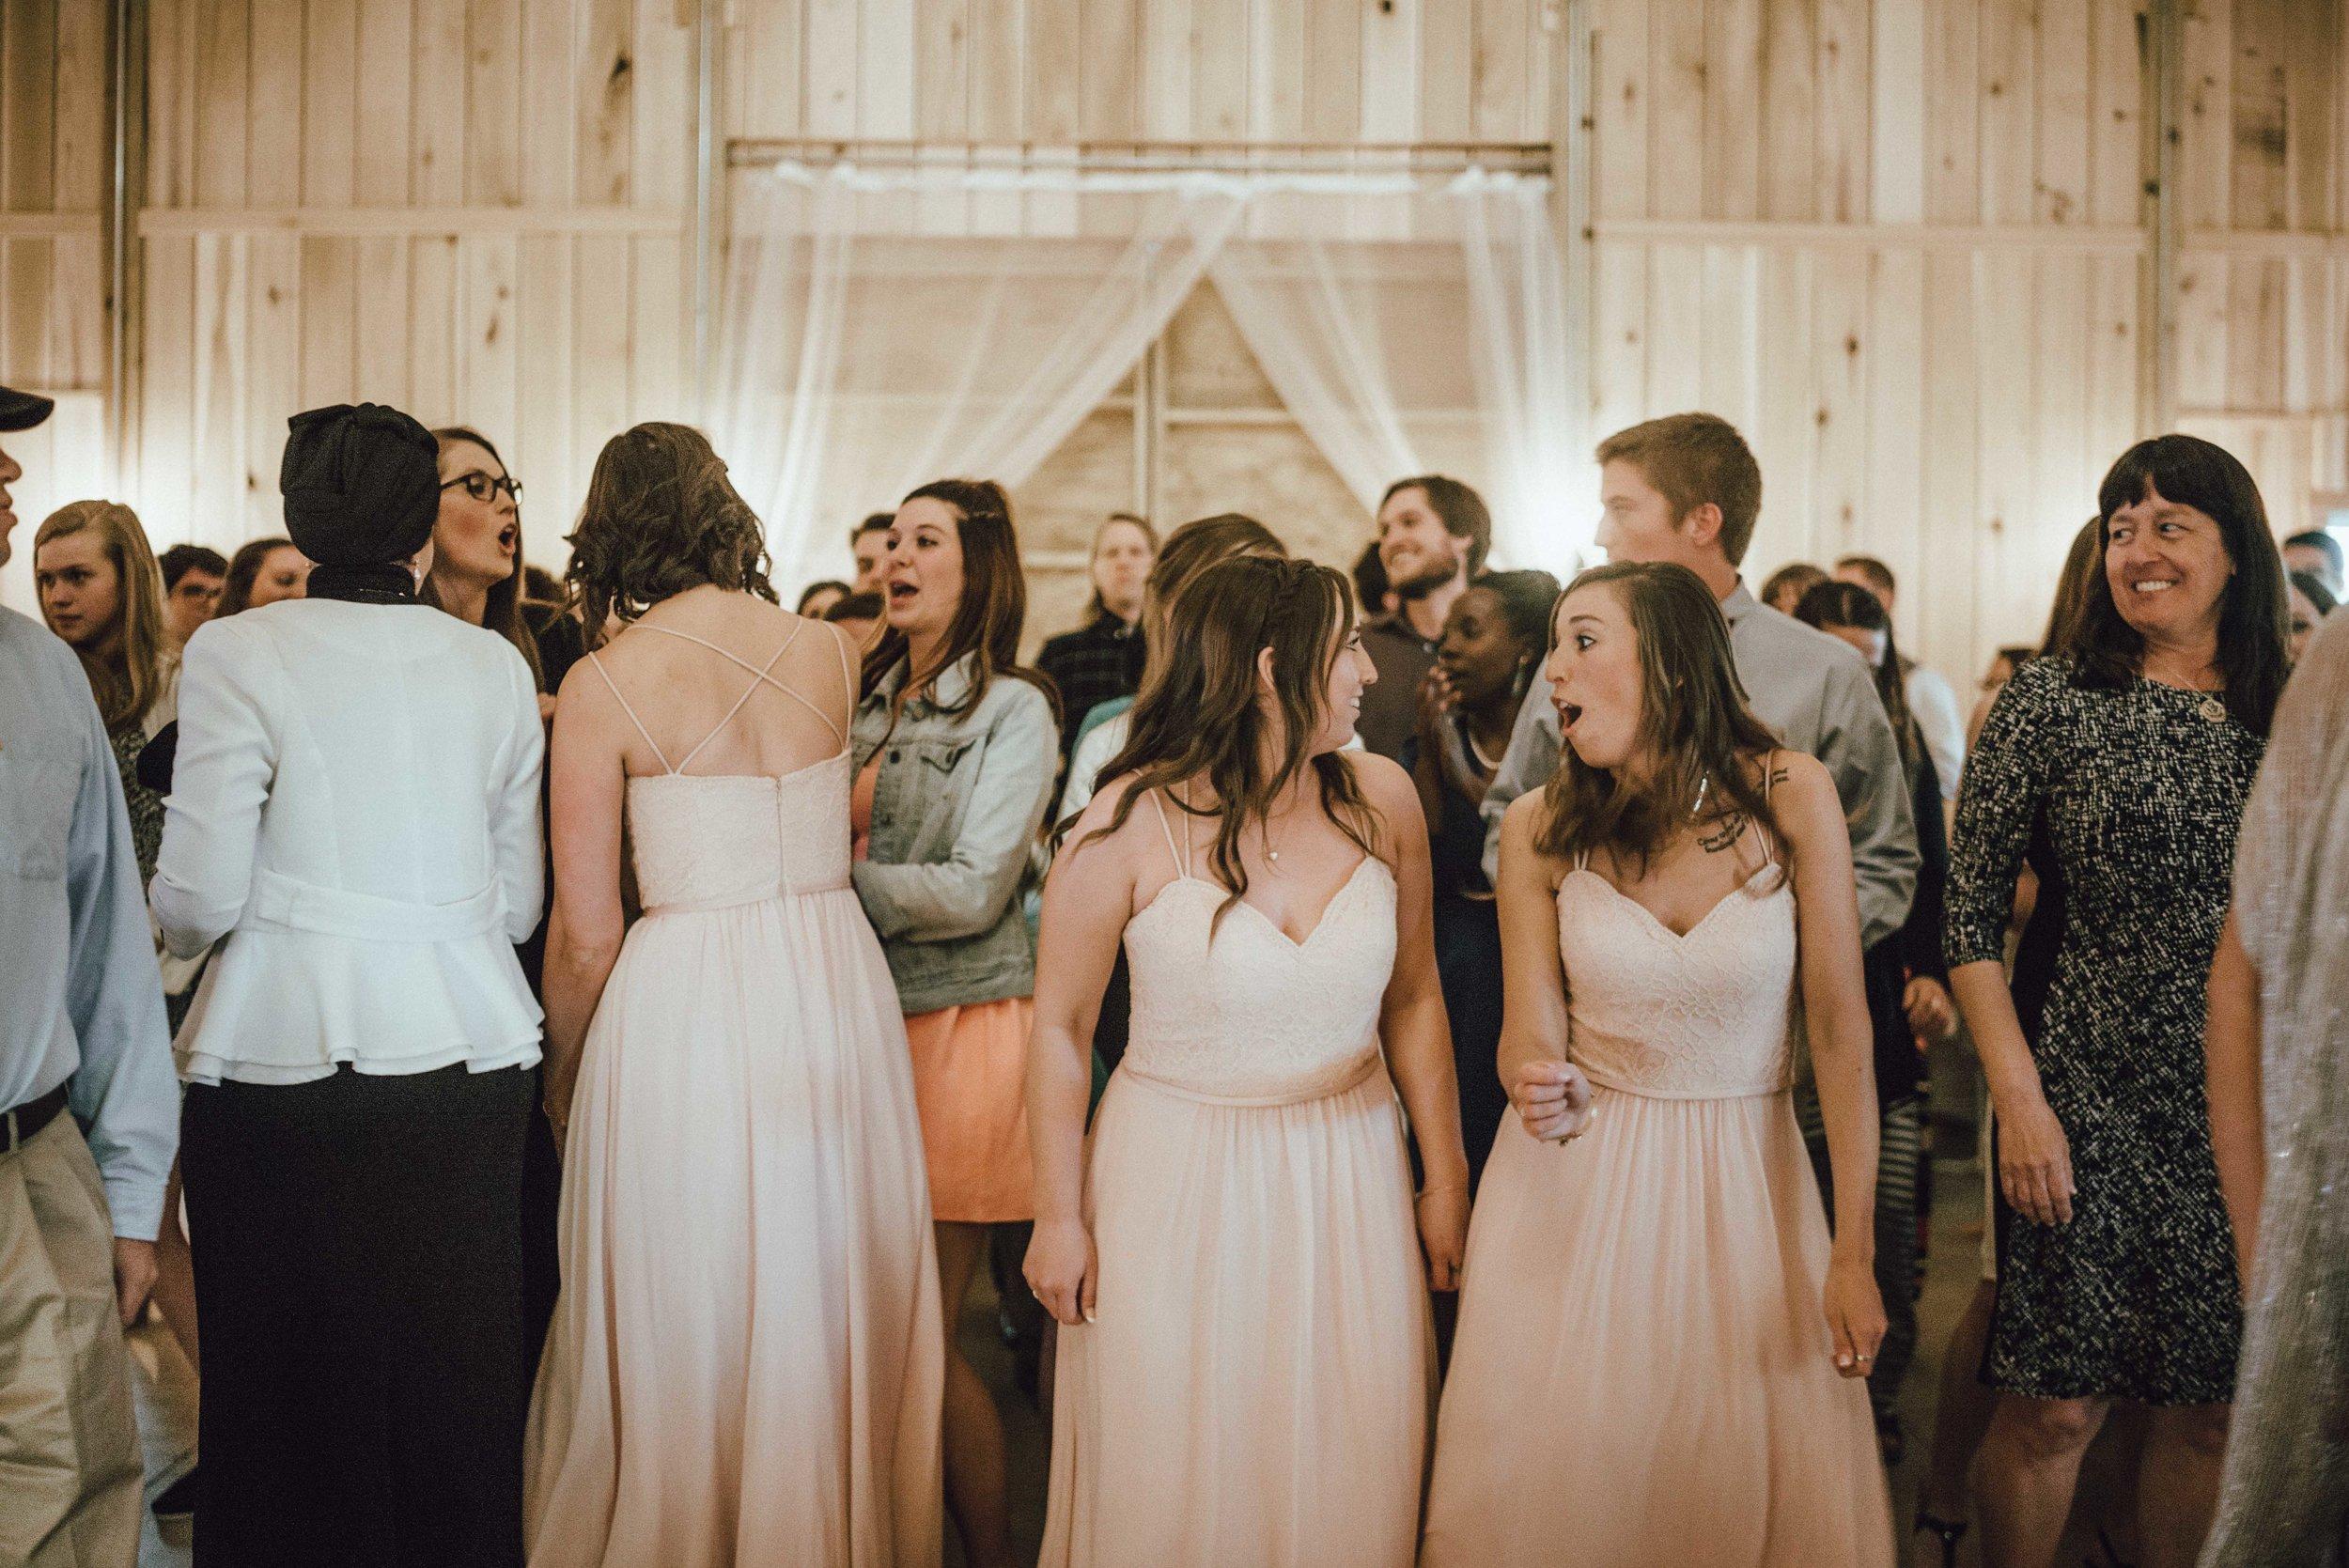 Steph-Ben-Blog-Indianapolis-Wedding-72.jpg